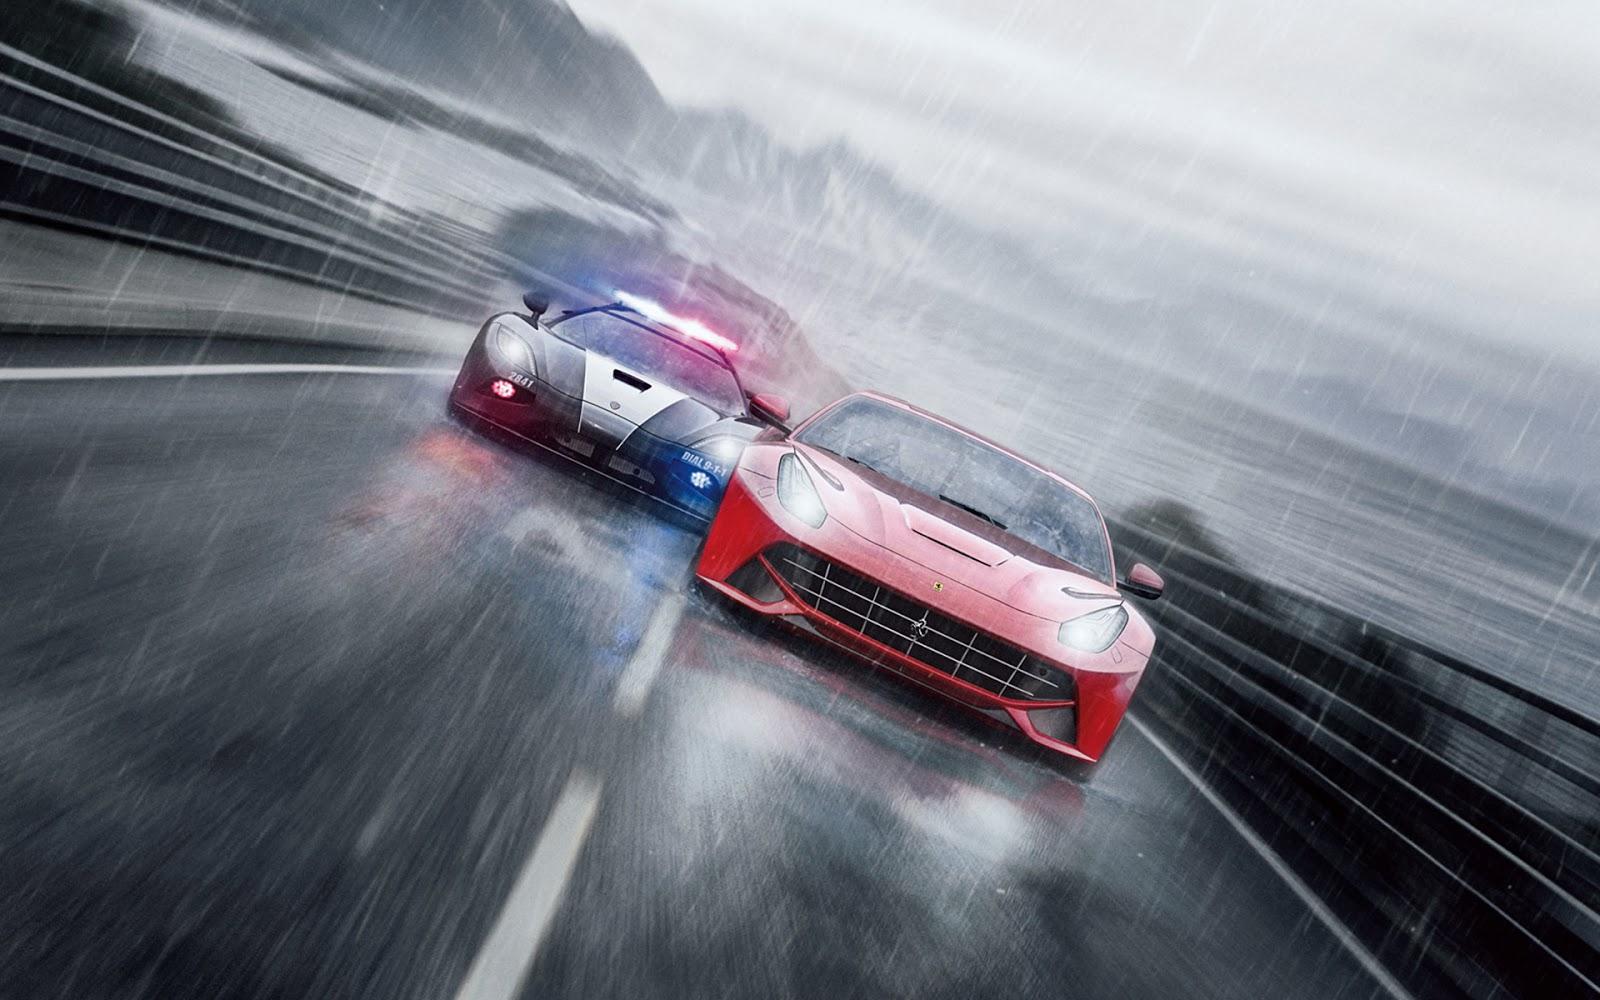 "<img src=""http://4.bp.blogspot.com/-JYCrmcTT-r4/UuqwPPDcImI/AAAAAAAAKt4/jNDwumlDzI0/s1600/need-for-speed-wallpaper.jpg"" alt=""need for speed wallpaper"" />"